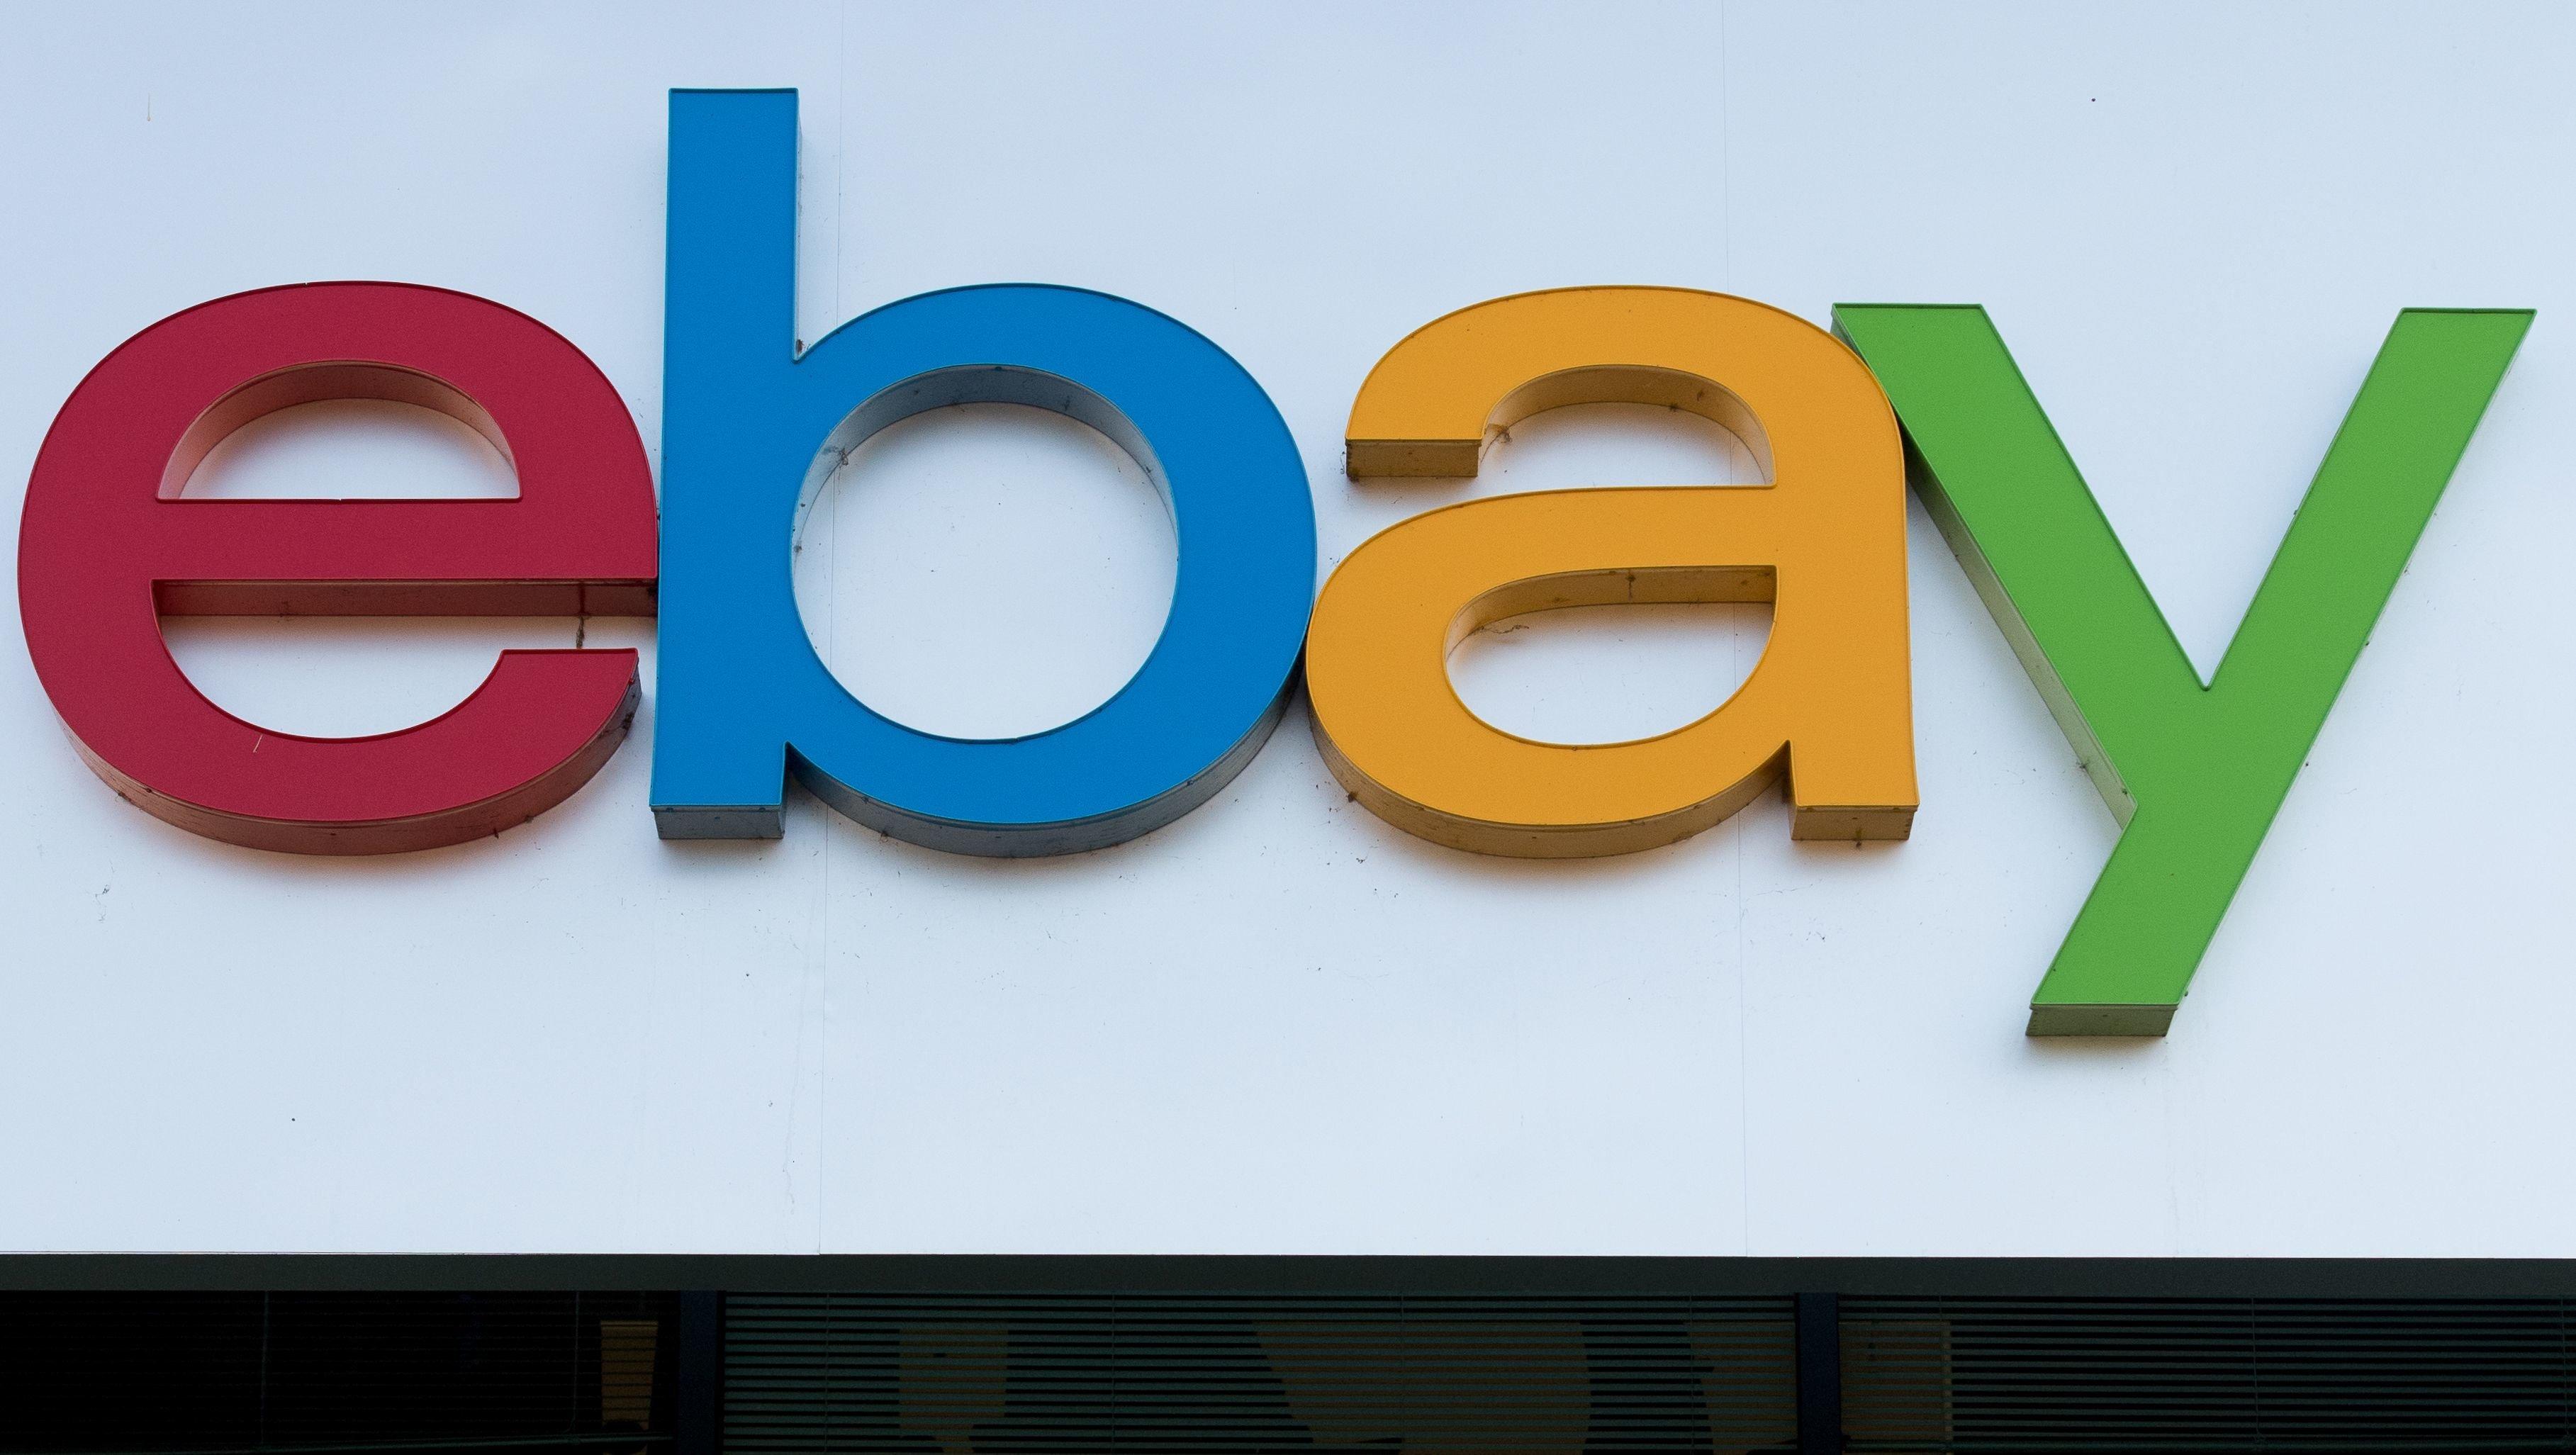 how to get ebay black friday deals